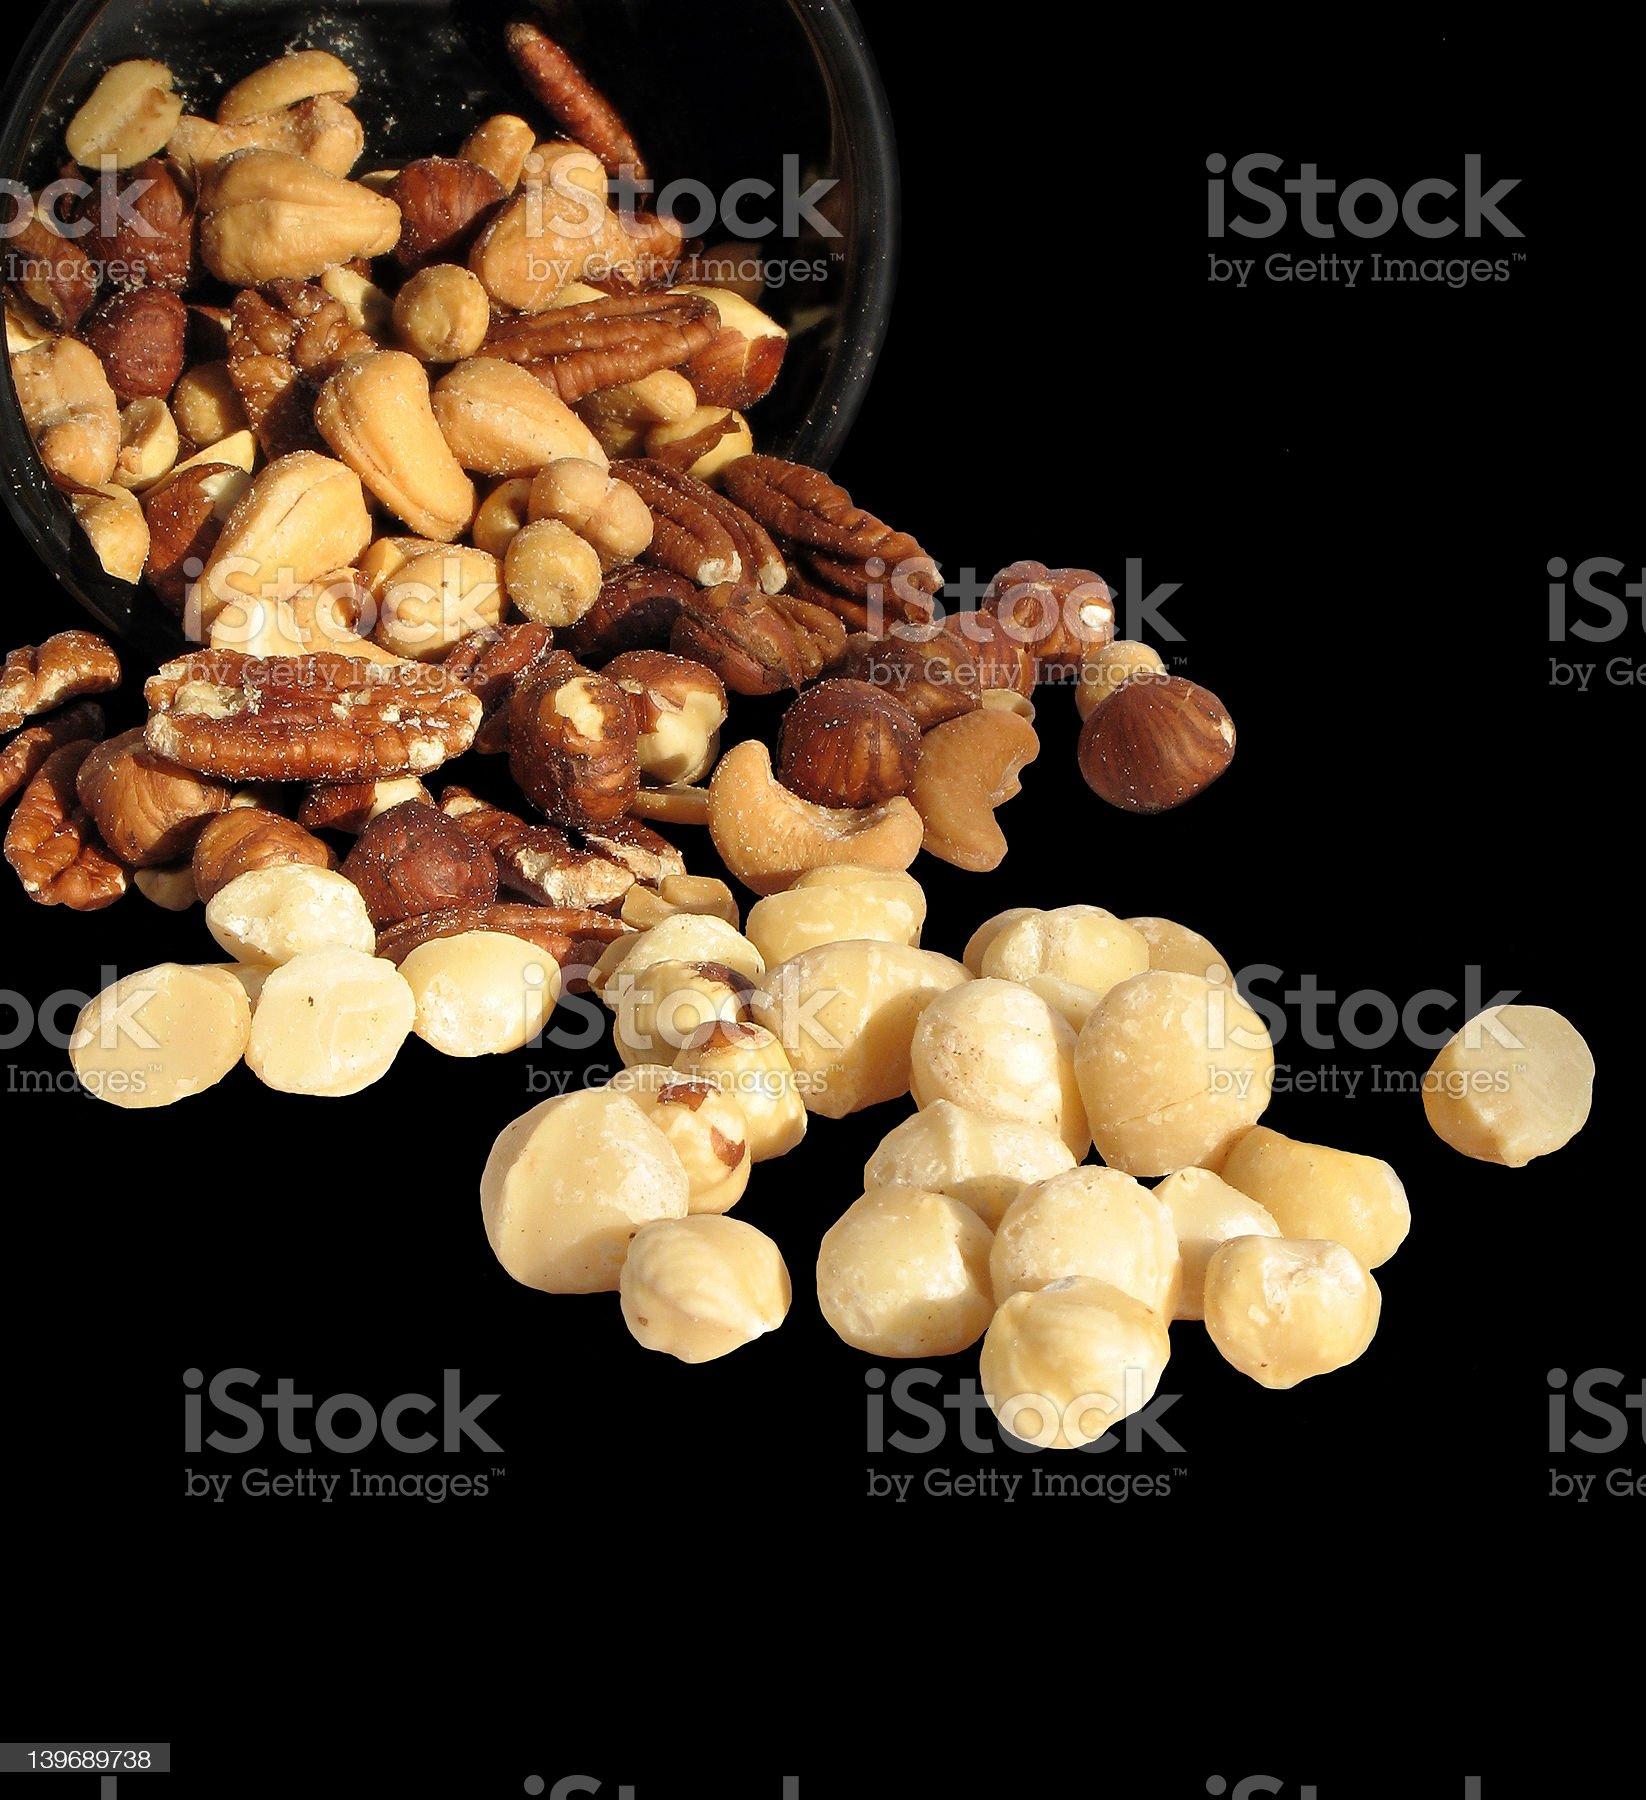 Nutsy royalty-free stock photo